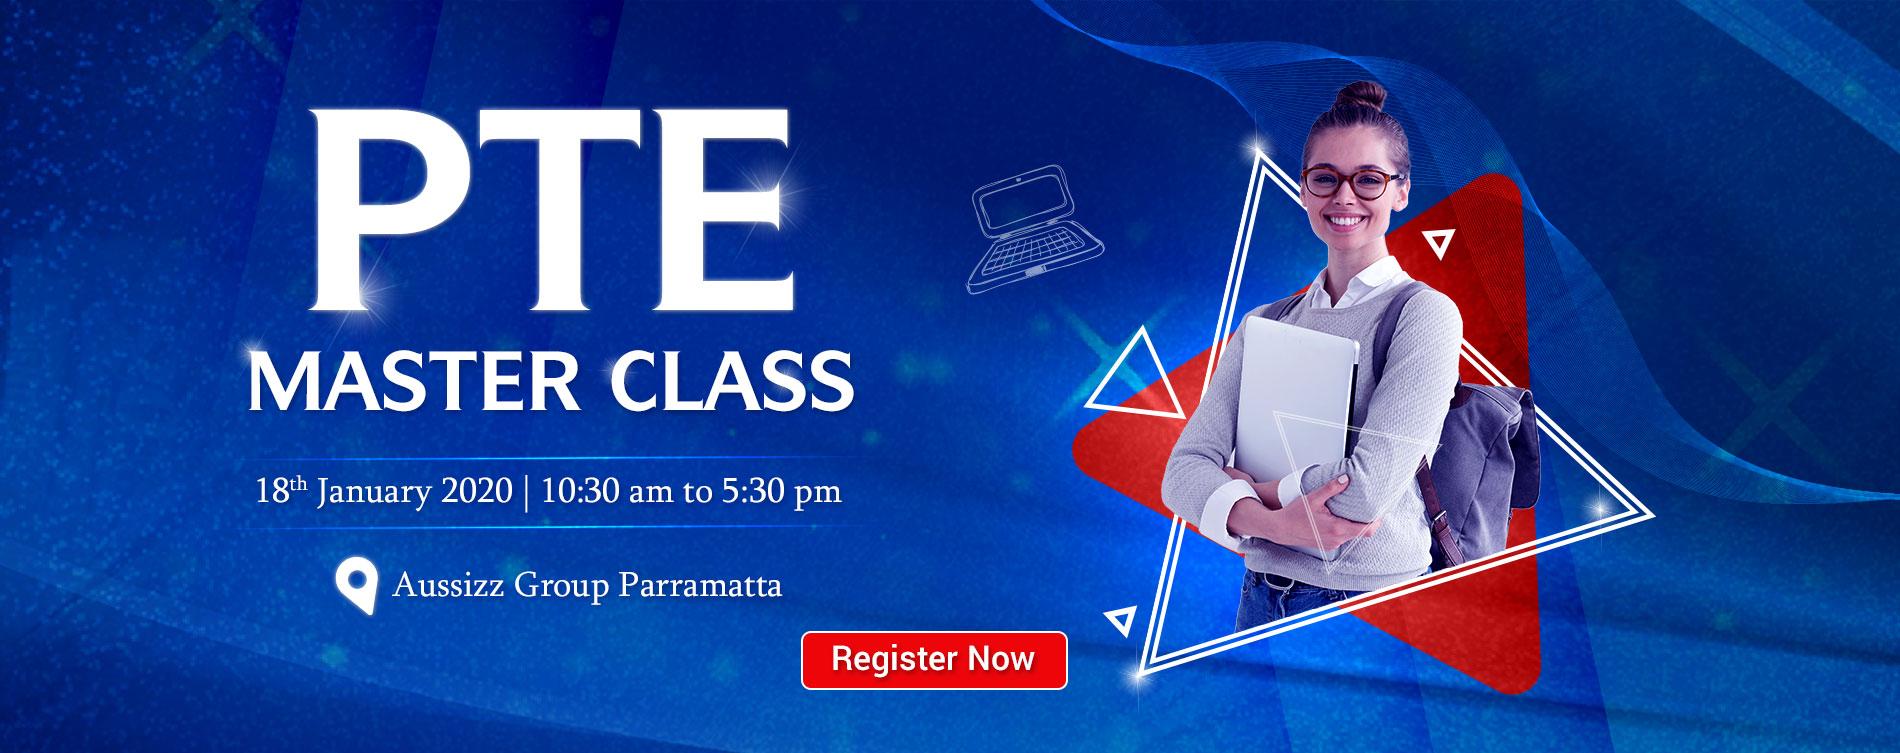 PTE Master Class